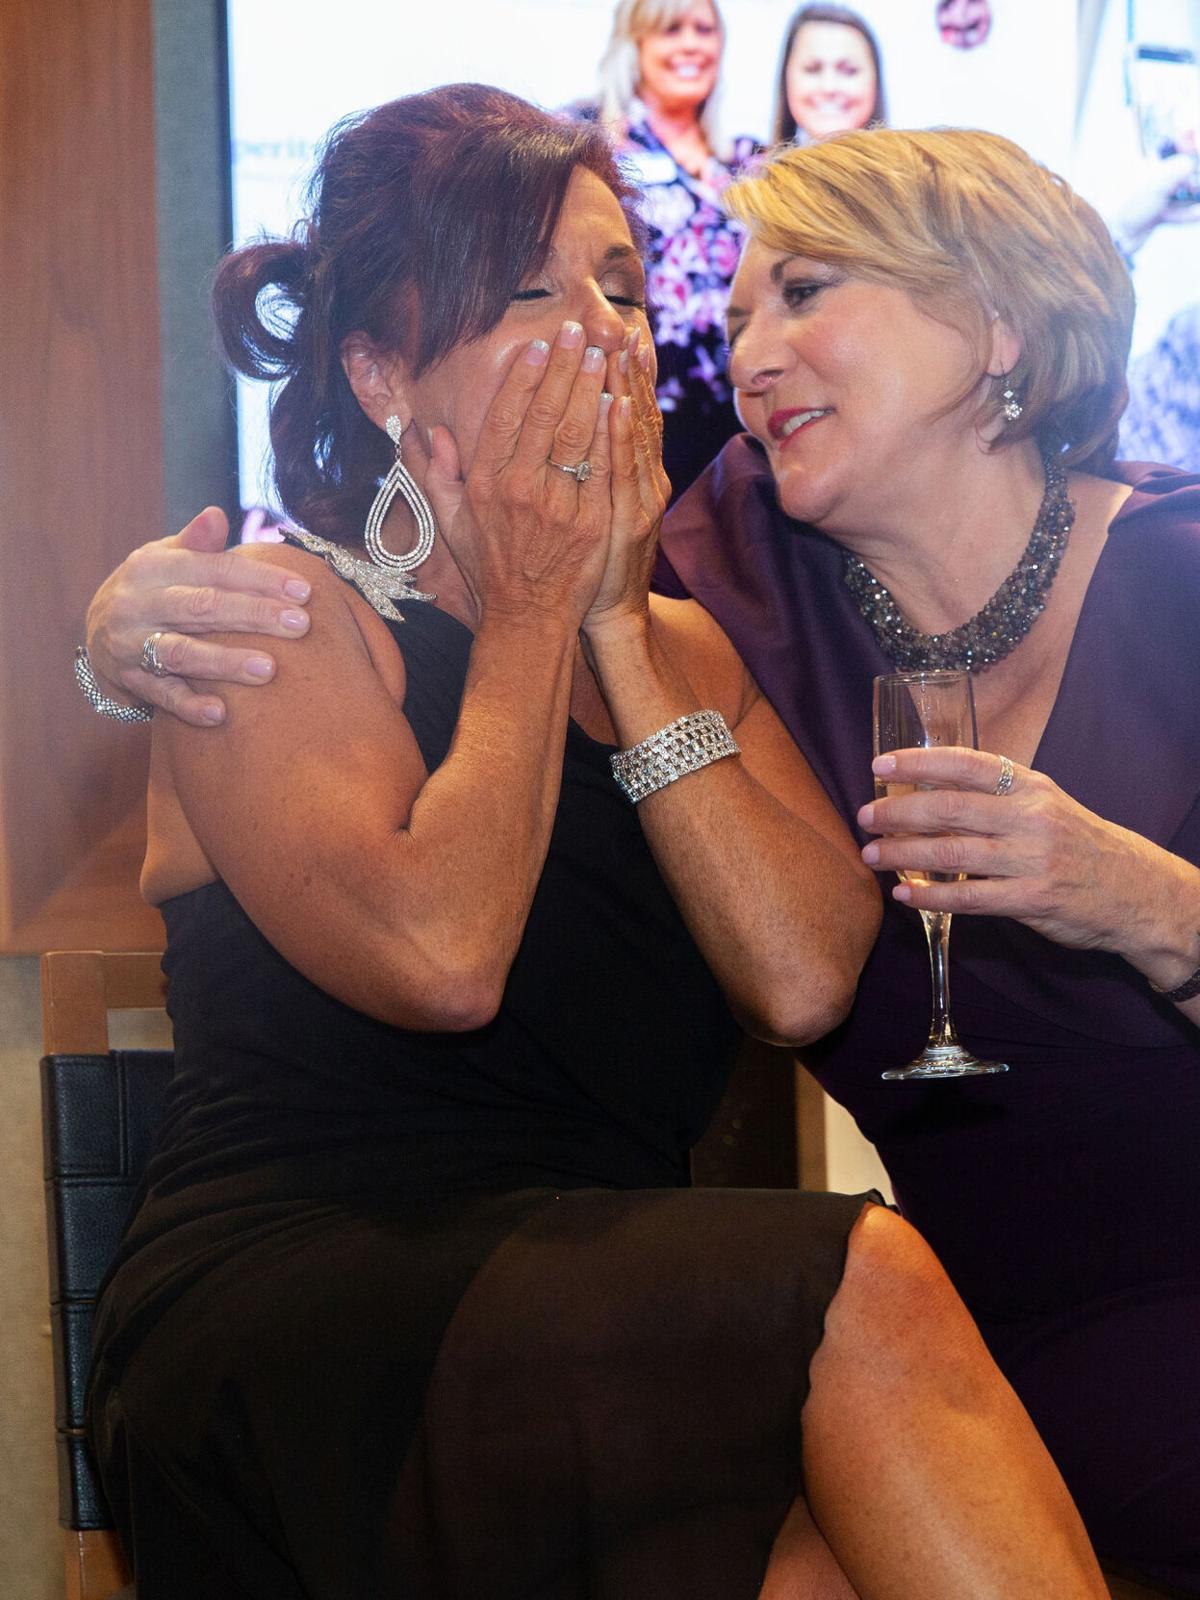 Maria Allshouse and Kim Adley